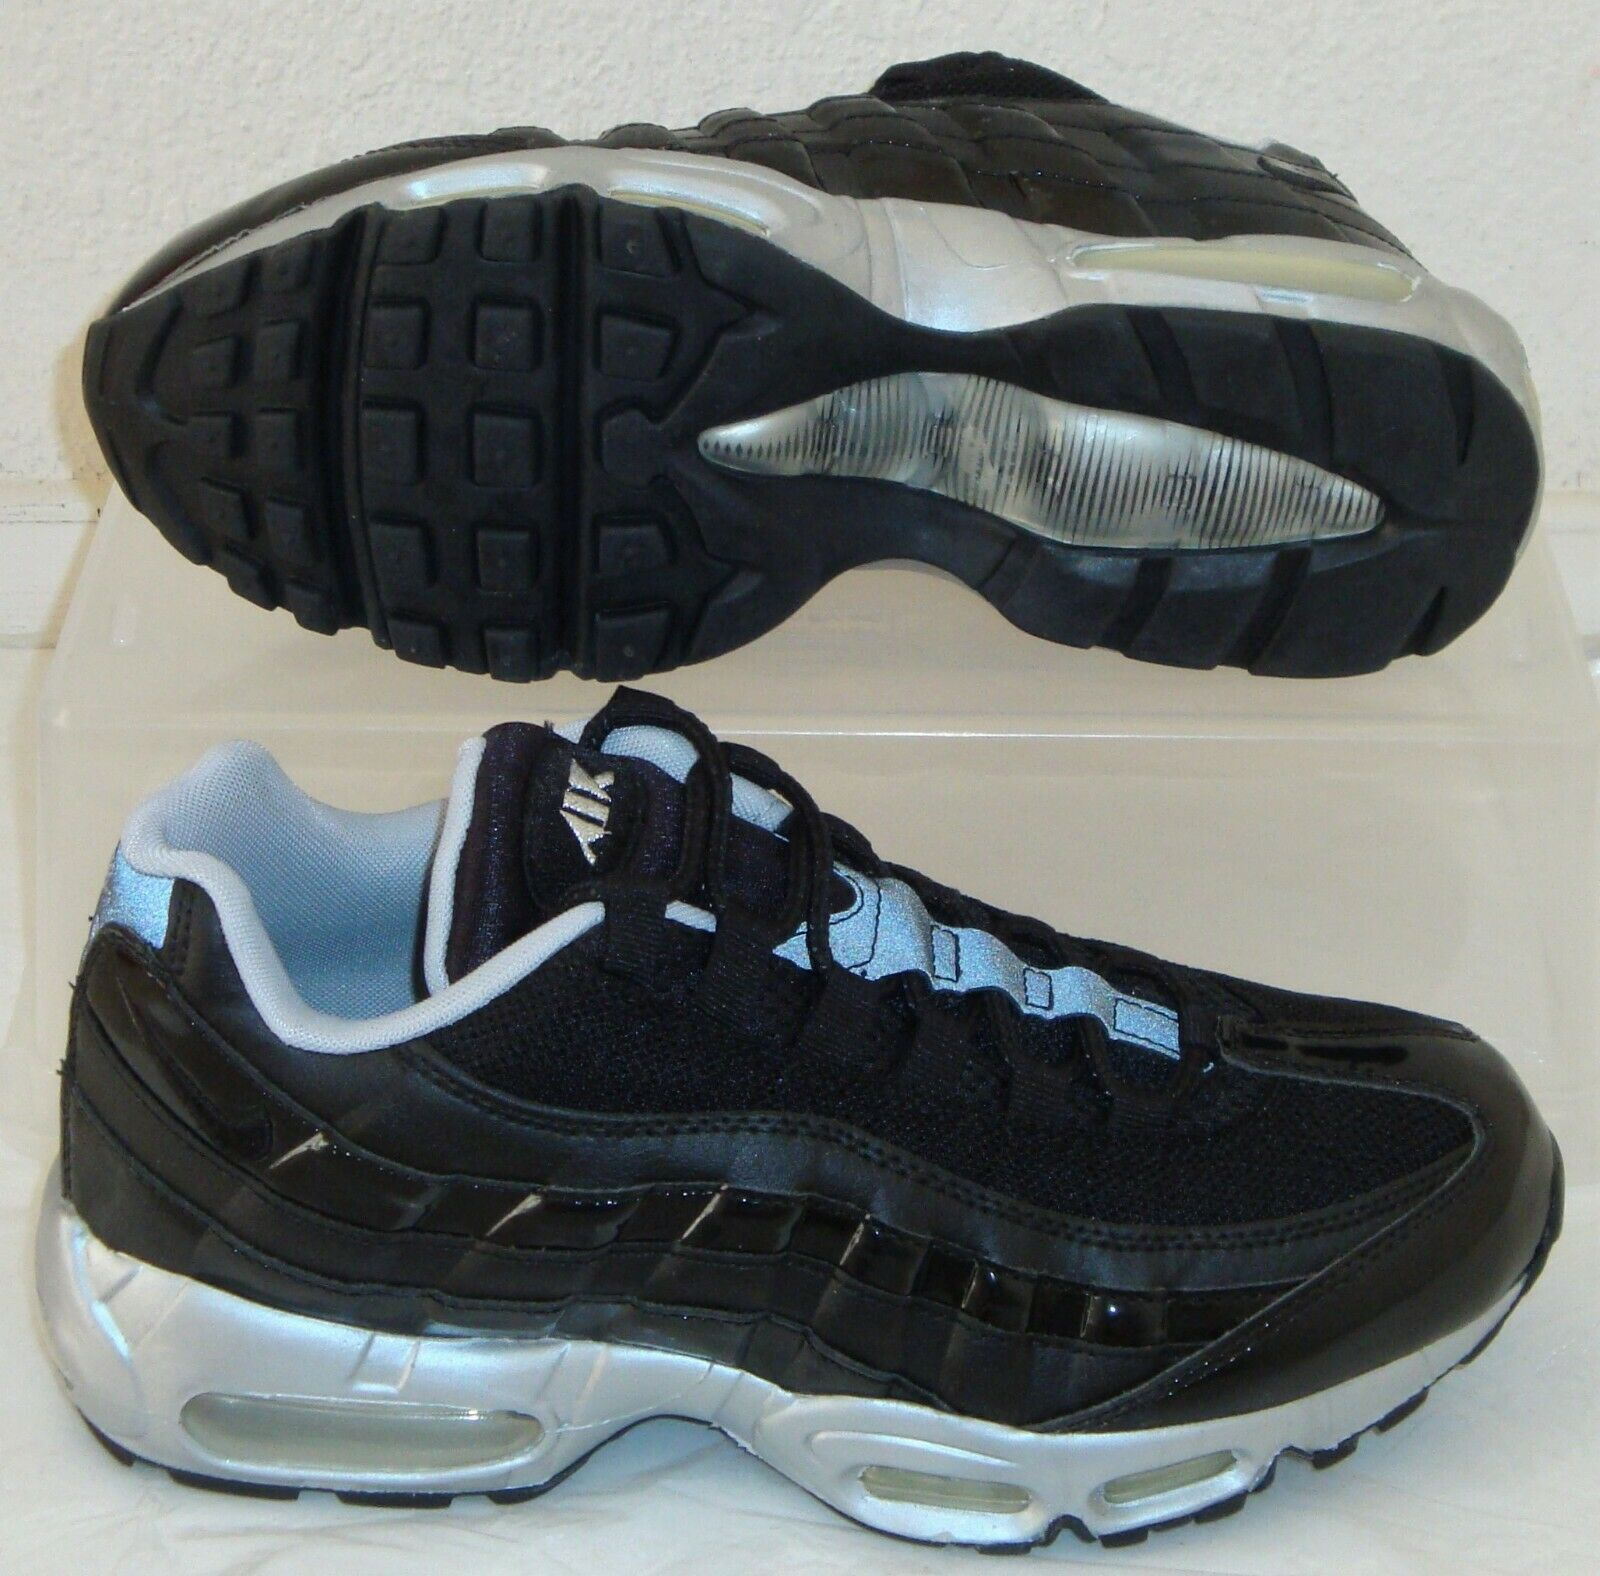 Size 7.5 - Nike Air Max 95 Black - 609048-027